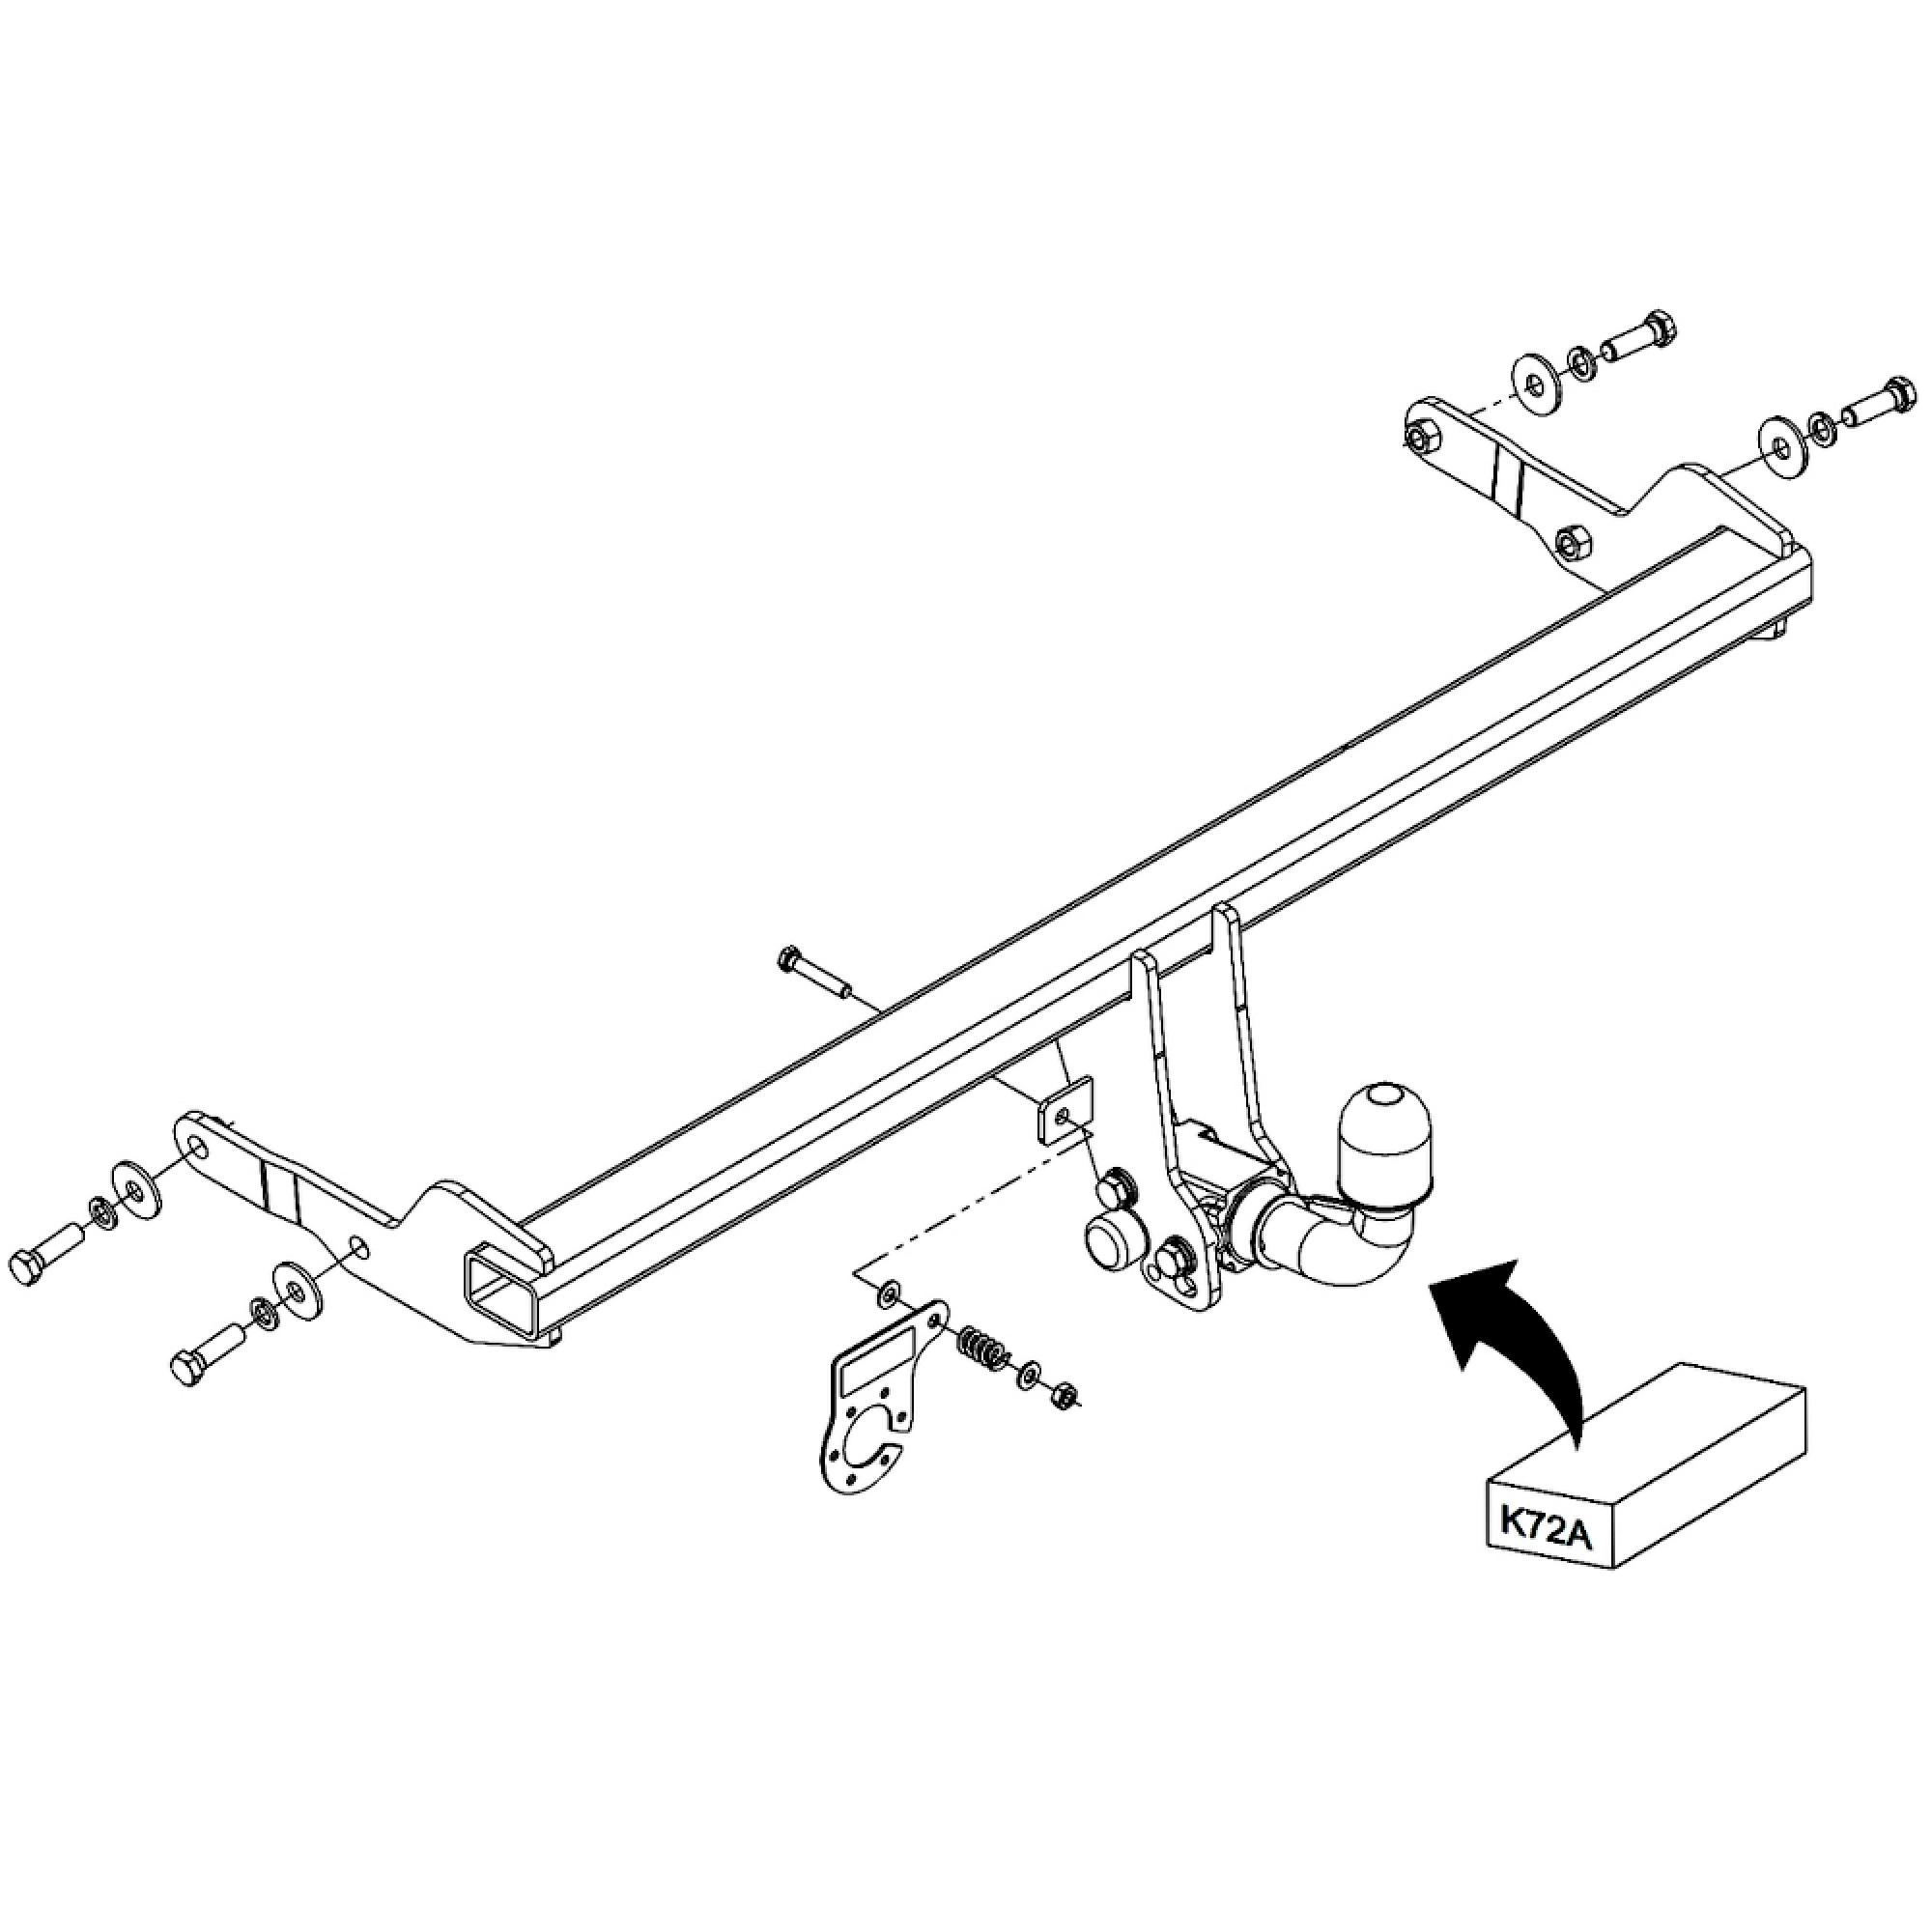 AutoHak enganche remolque extraíble para seat ibiza V 13pol espec preparación remol